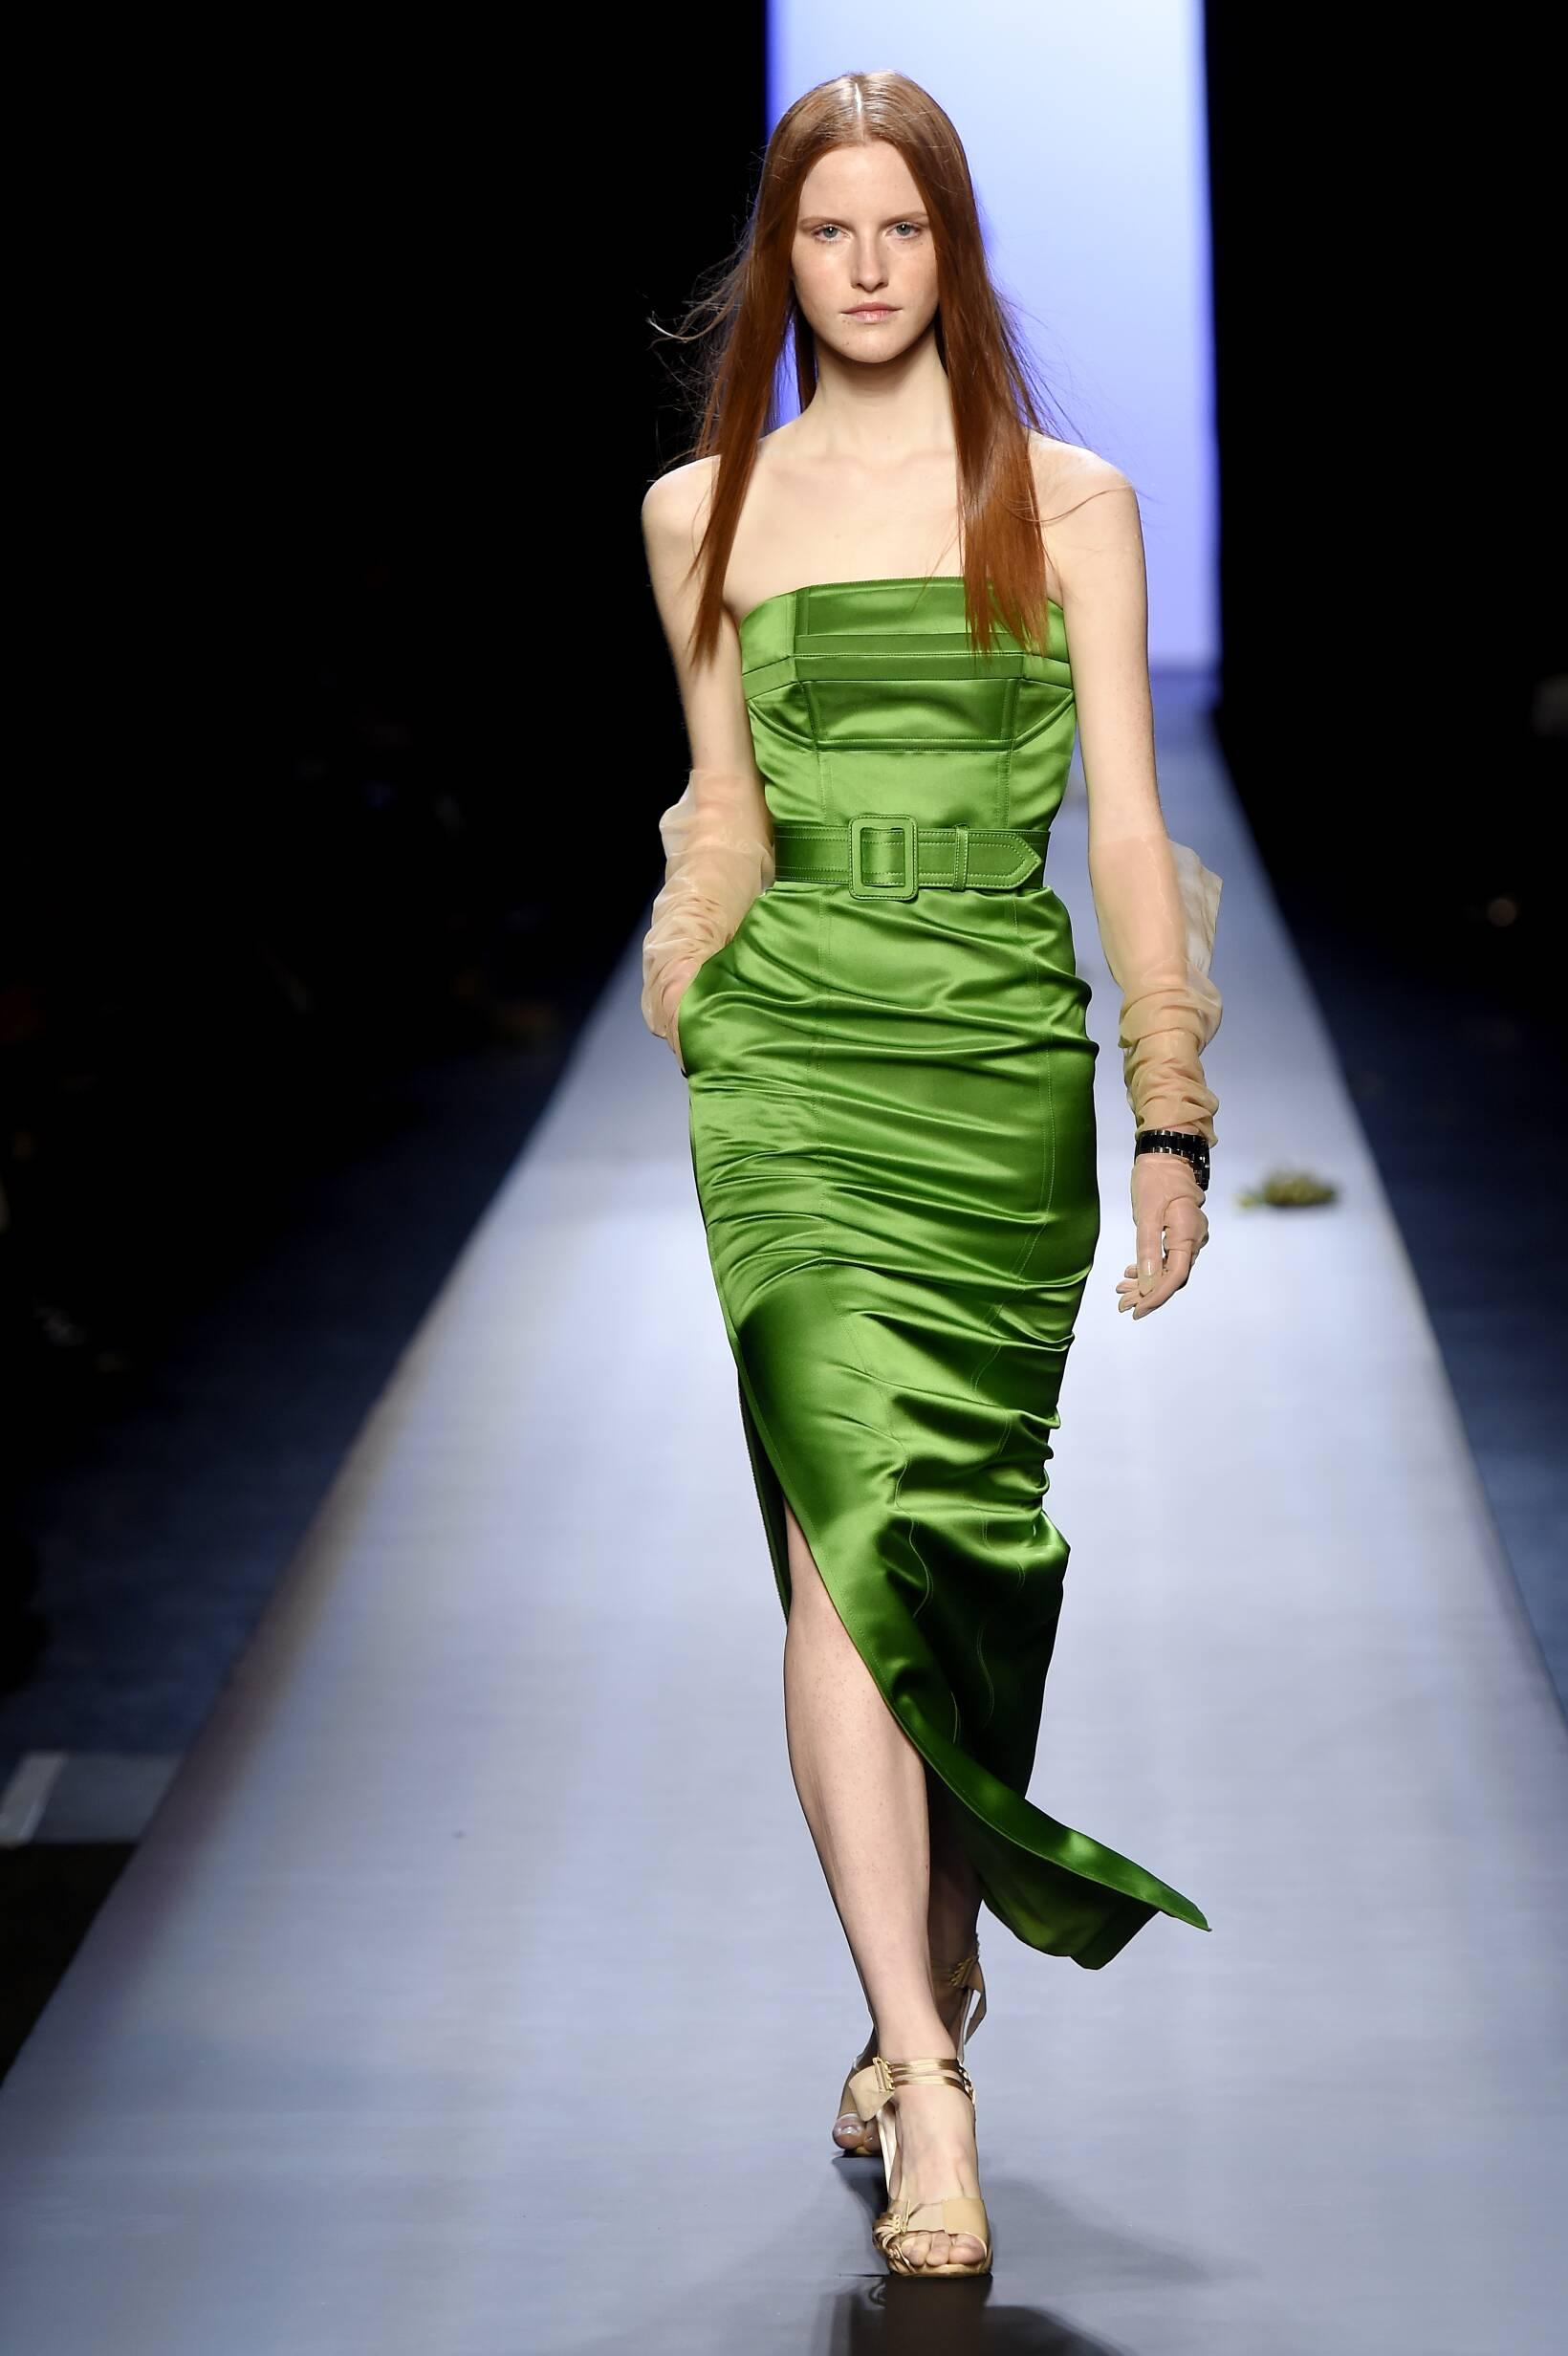 Jean Paul Gaultier Haute Couture Collection Women's 2015